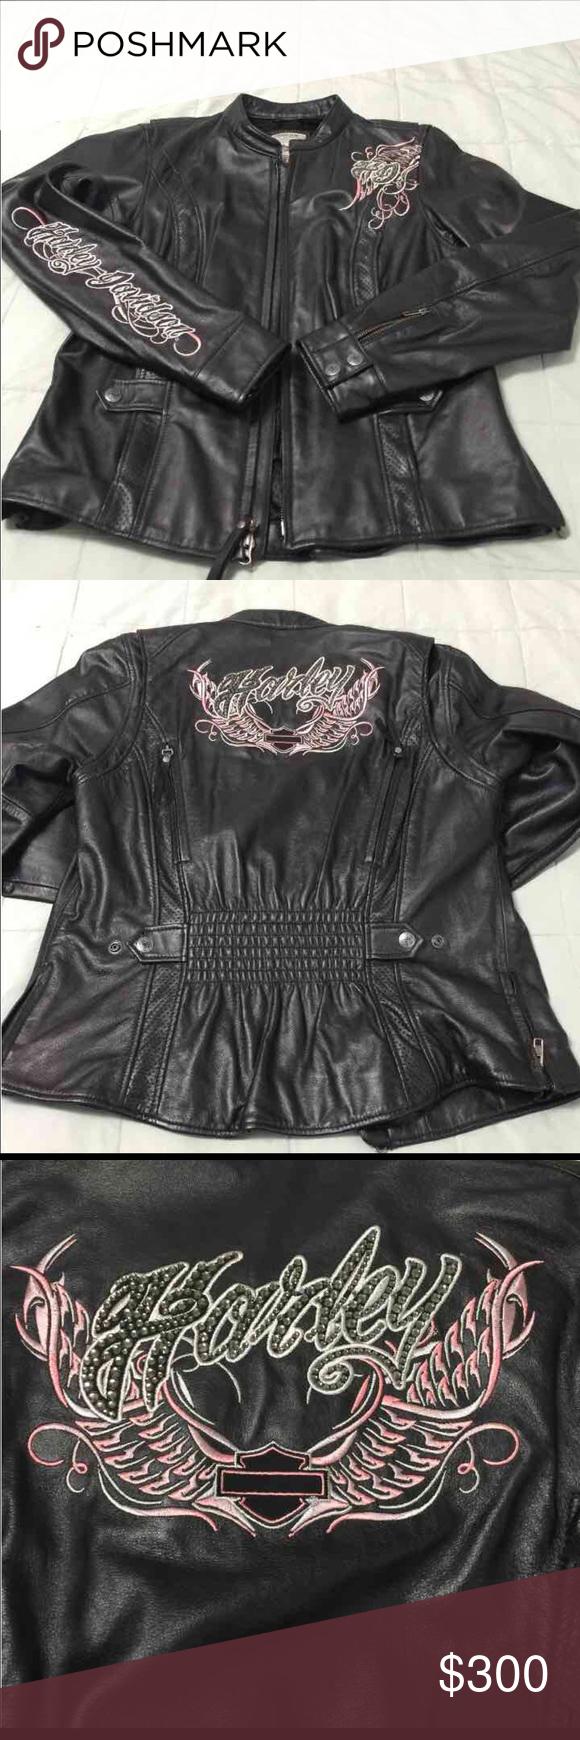 Ladies Harley Davidson Leather Jacket Nwot Bling Harley Davidson Leather Jackets Leather Jacket Harley Davidson Jacket [ 1740 x 580 Pixel ]